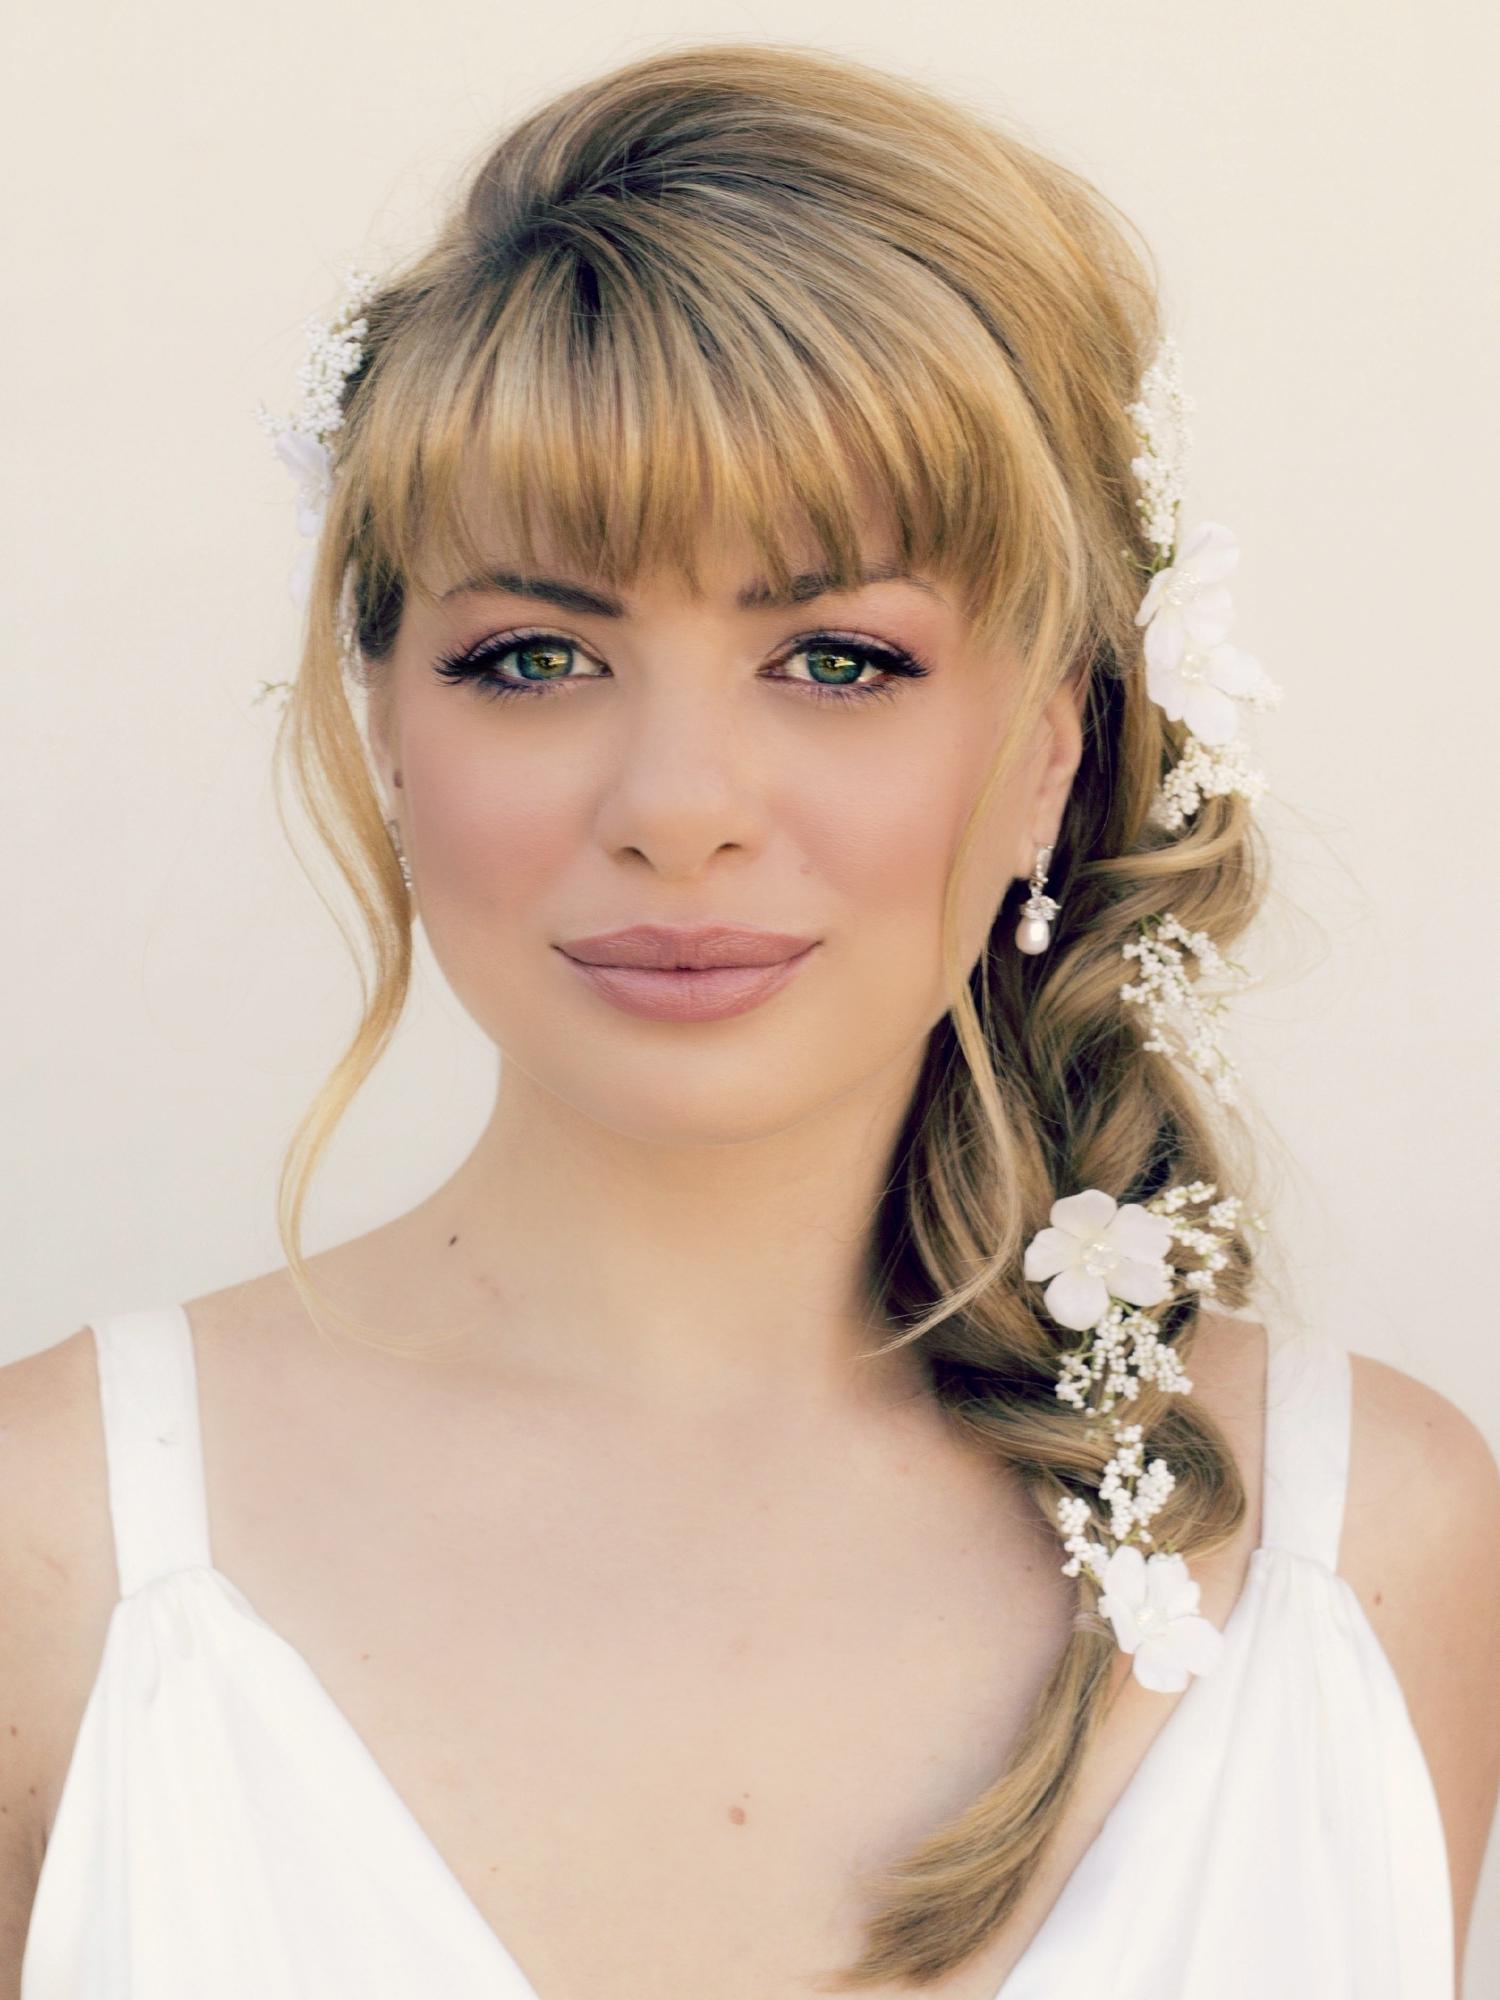 Updos For Medium Hair With Bangs – Women Medium Haircut With Updos For Layered Hair With Bangs (View 15 of 15)